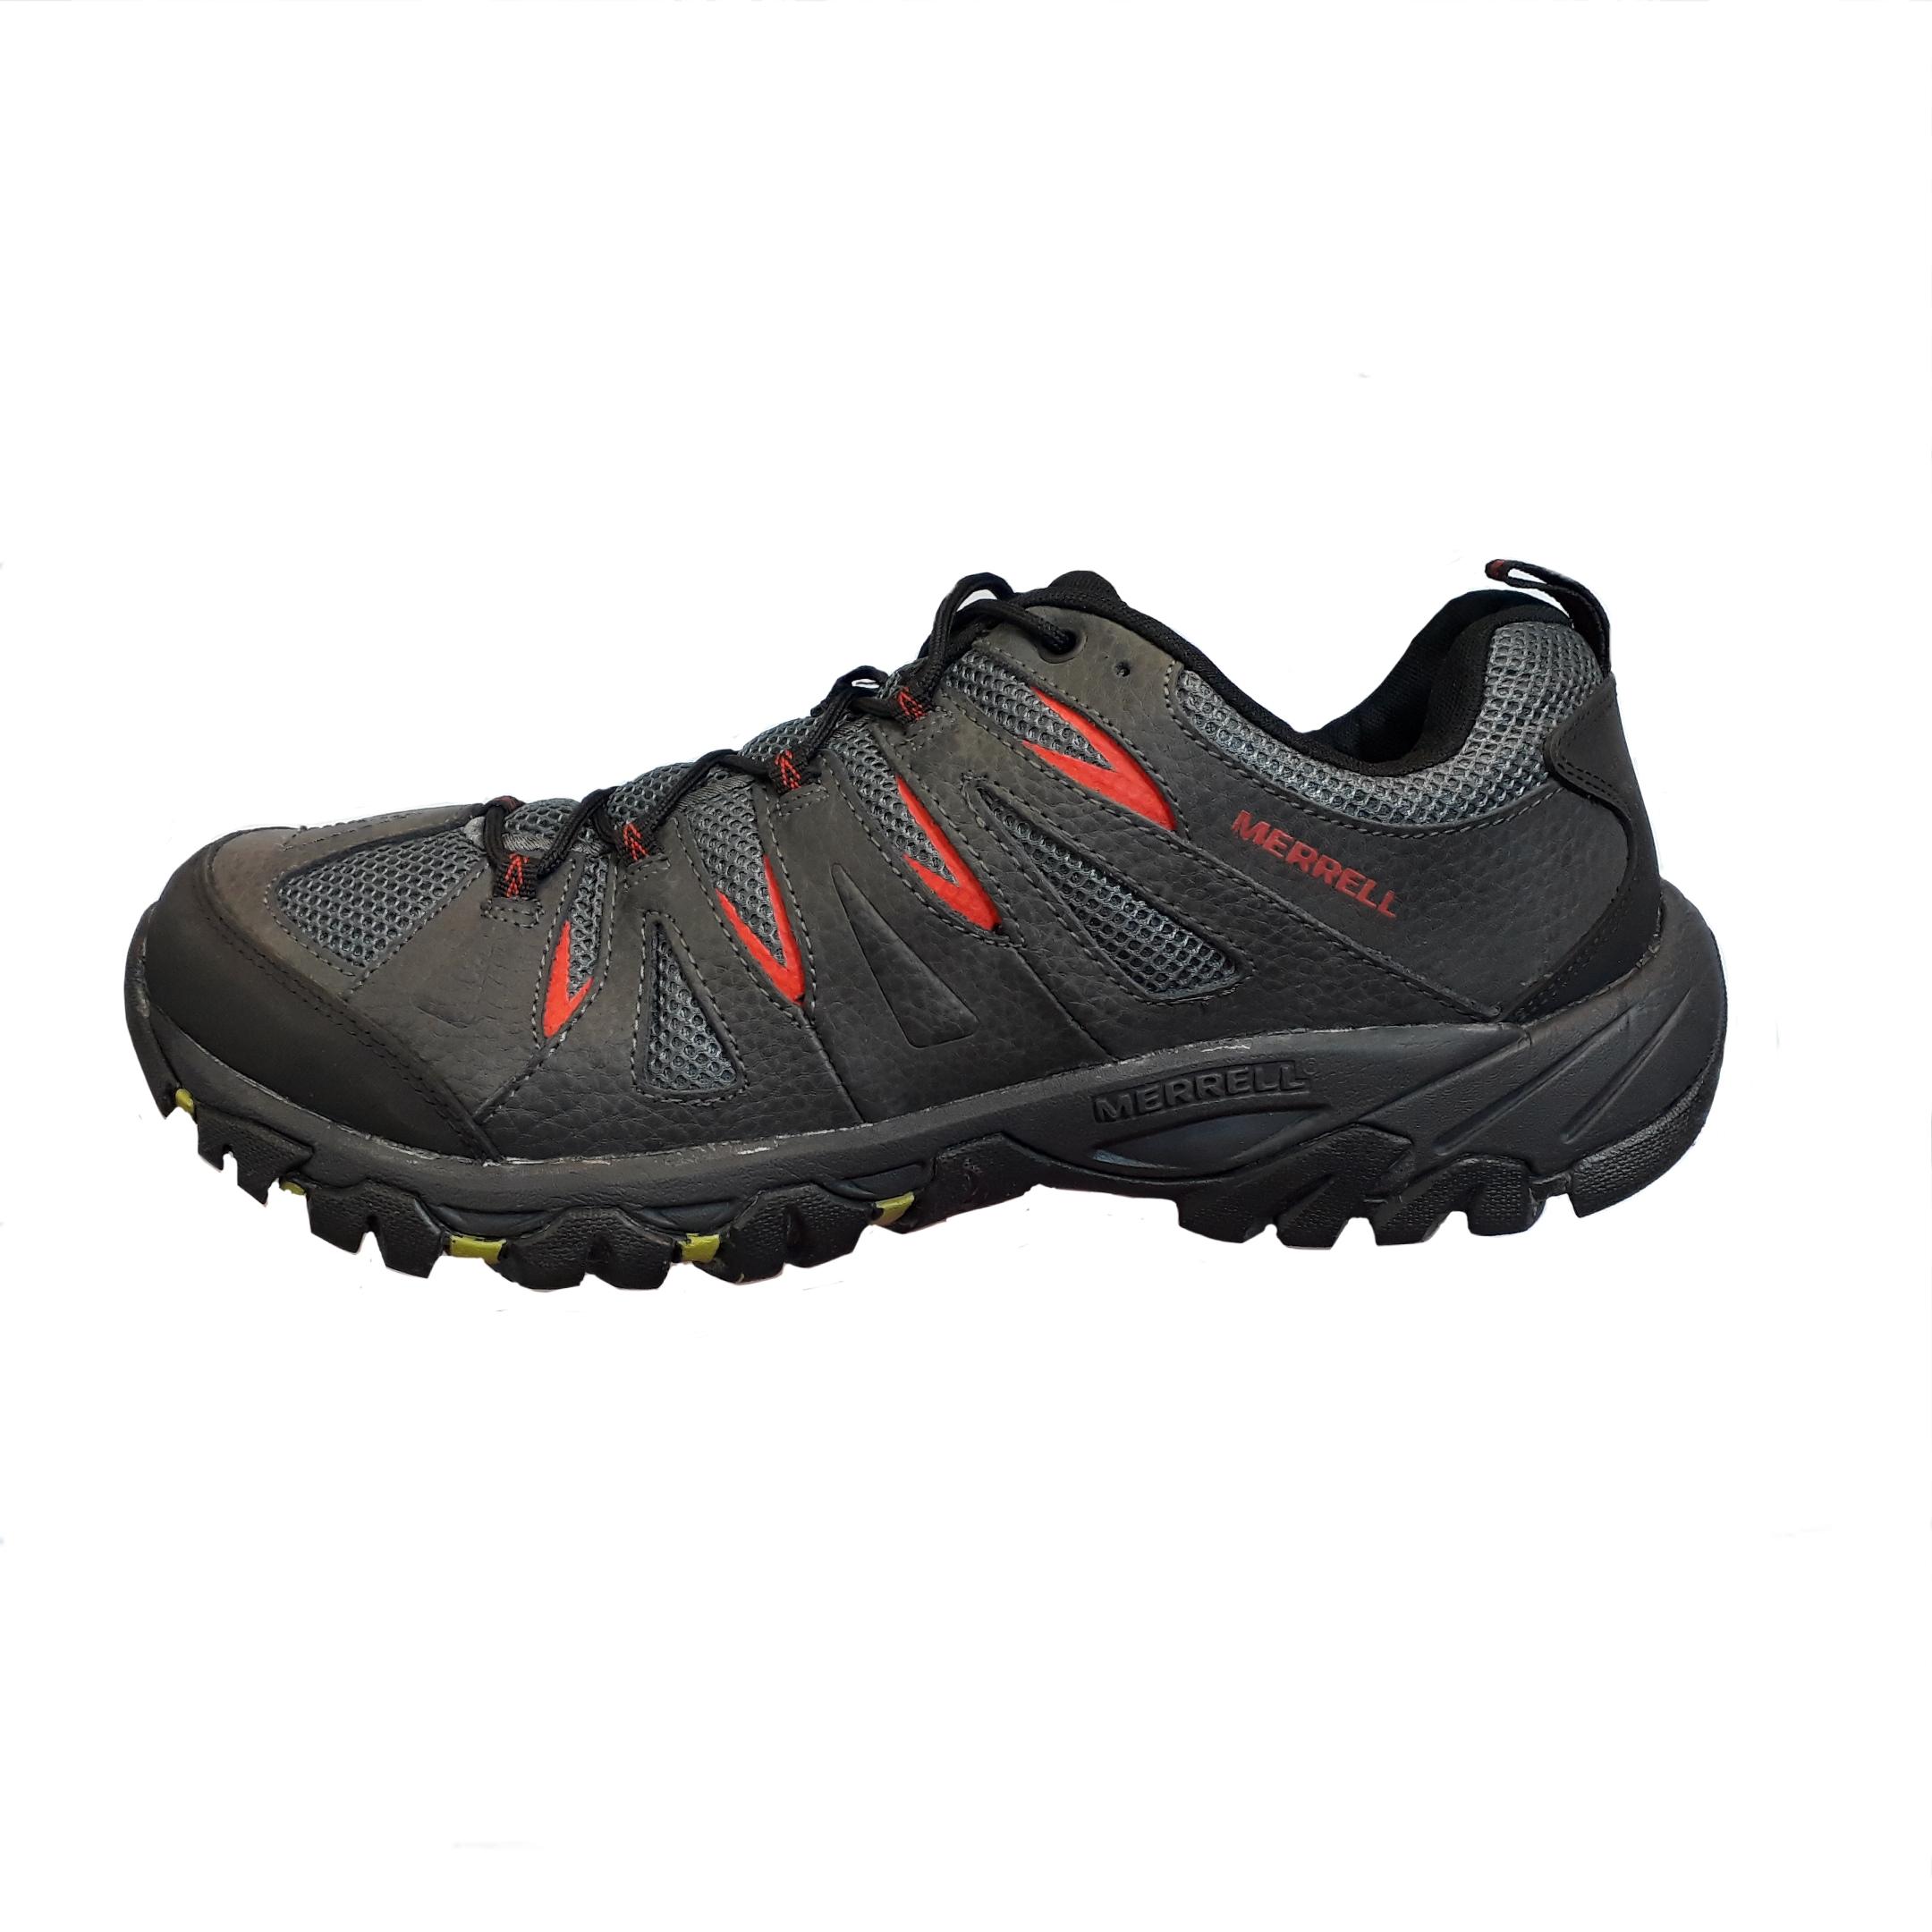 قیمت کفش کوهنوردی مردانه مرل مدل waltop 2